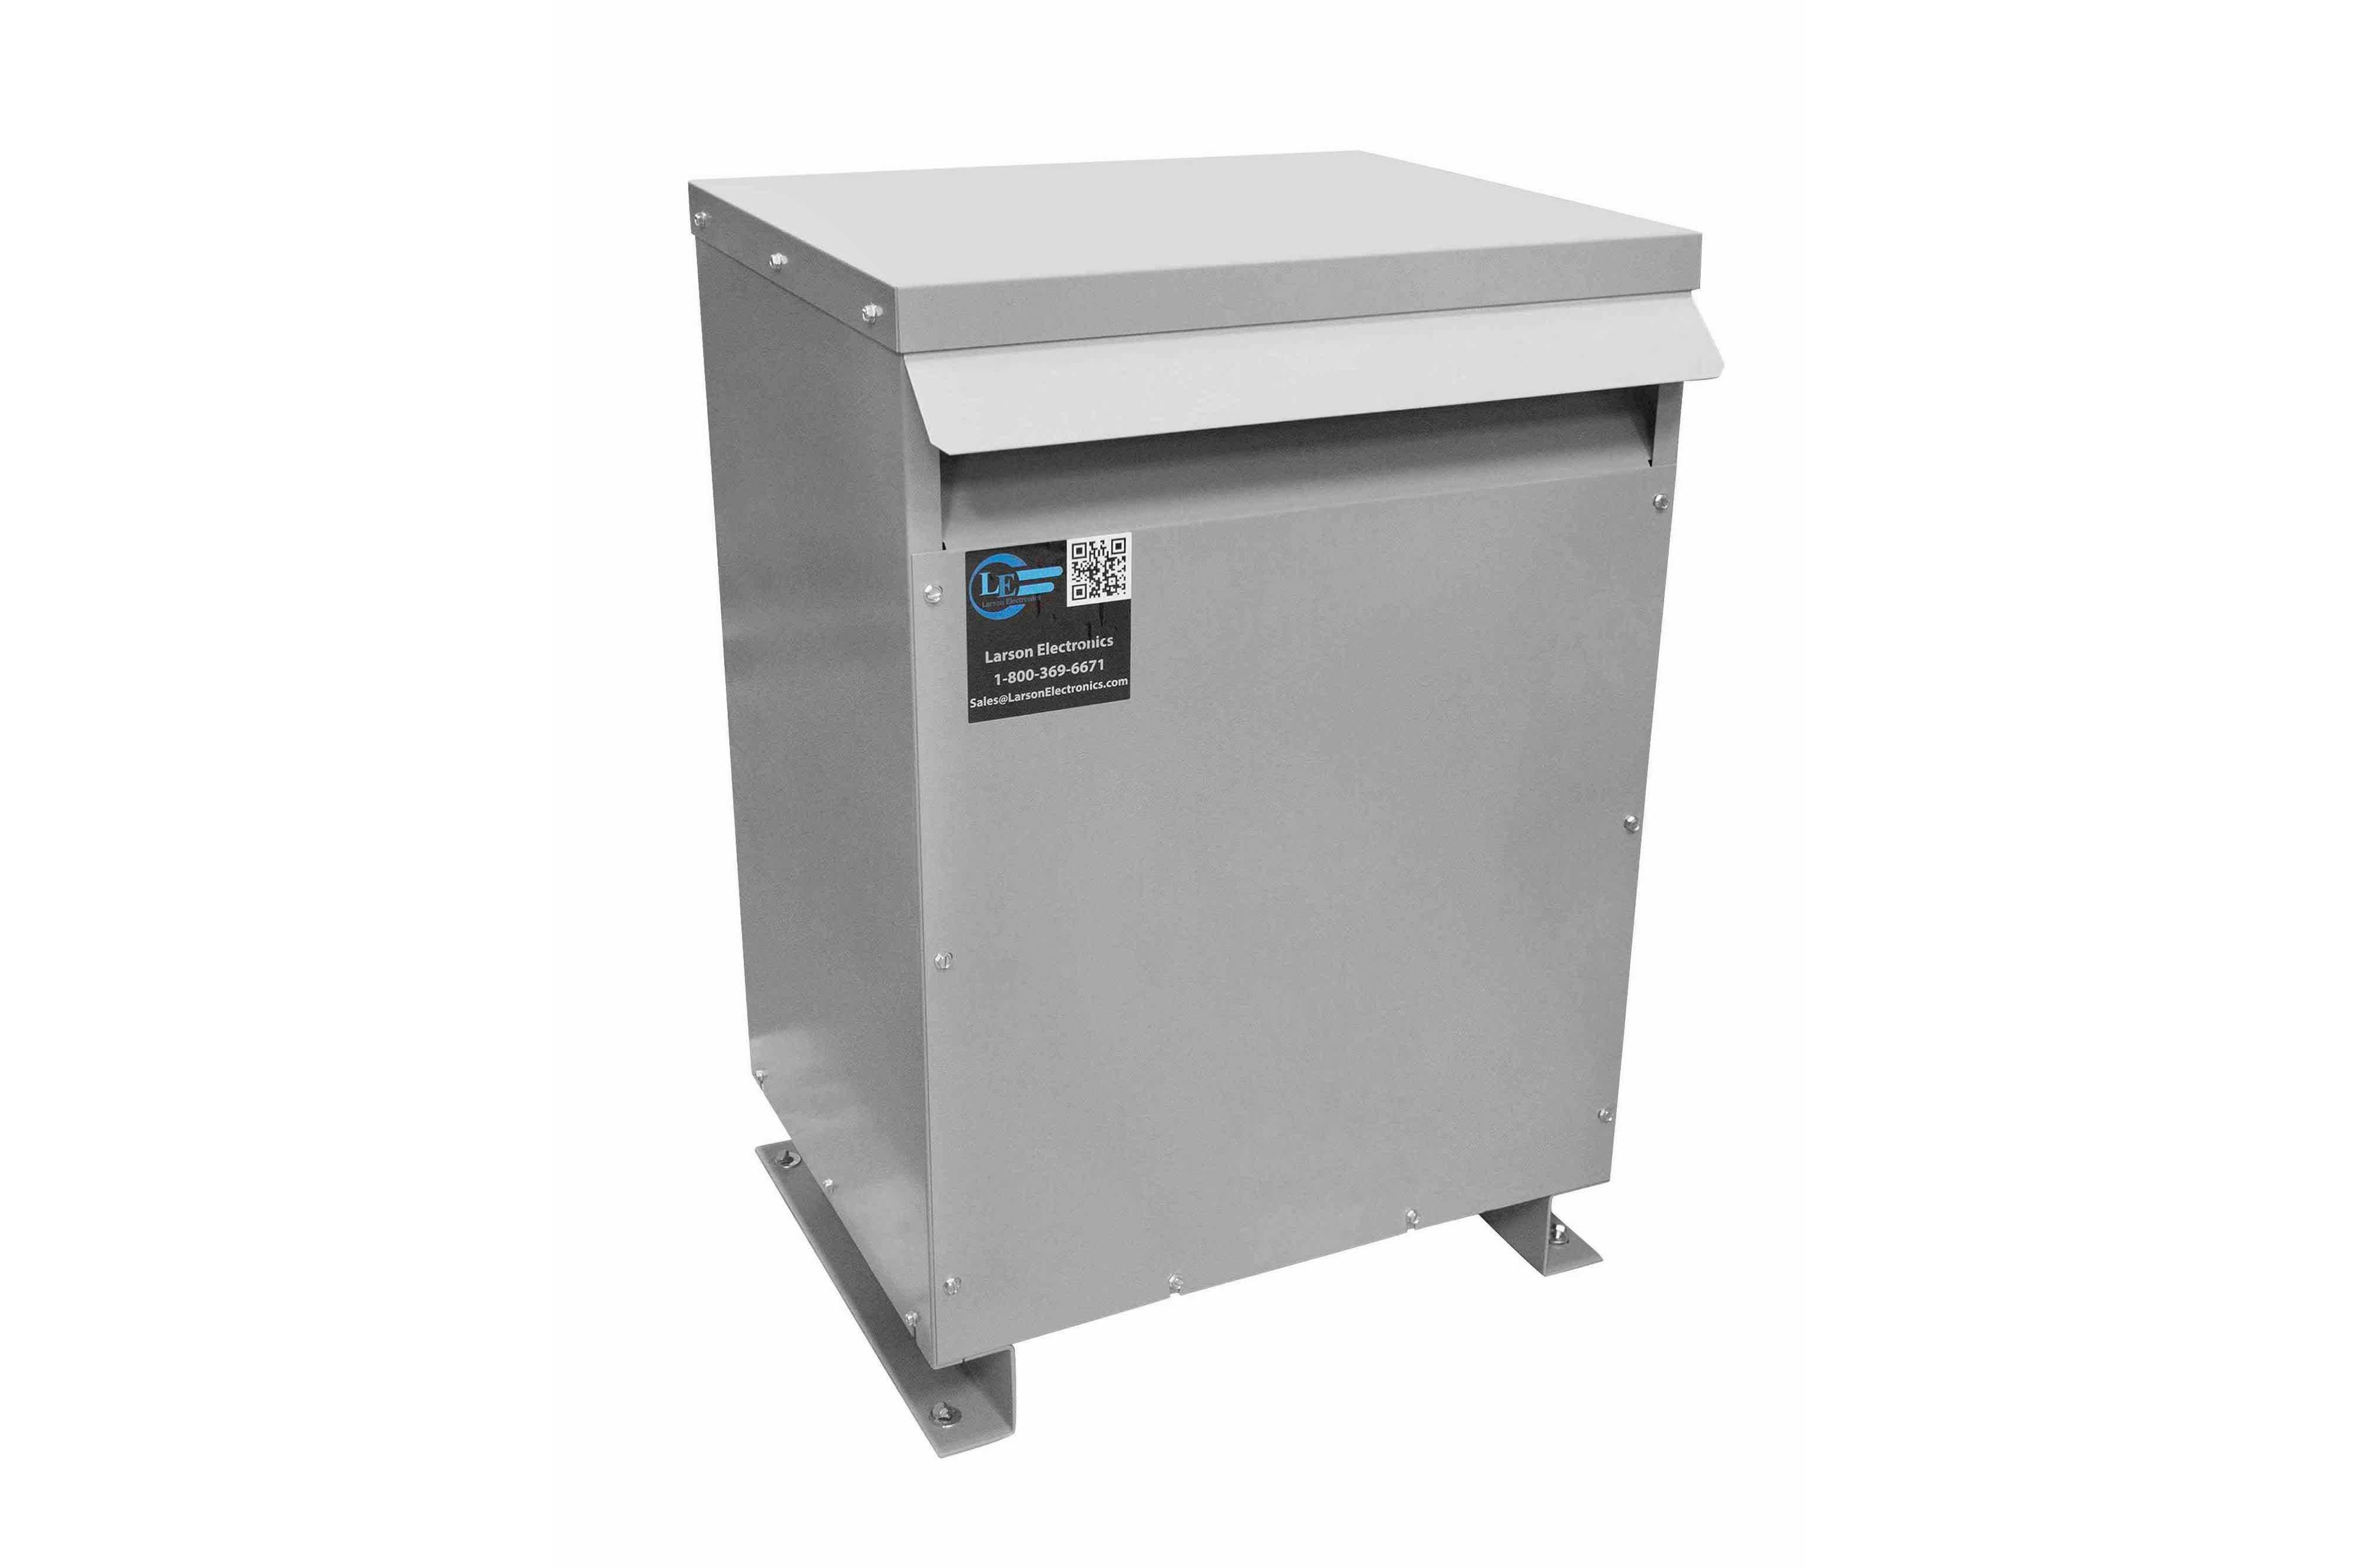 125 kVA 3PH Isolation Transformer, 460V Wye Primary, 575Y/332 Wye-N Secondary, N3R, Ventilated, 60 Hz